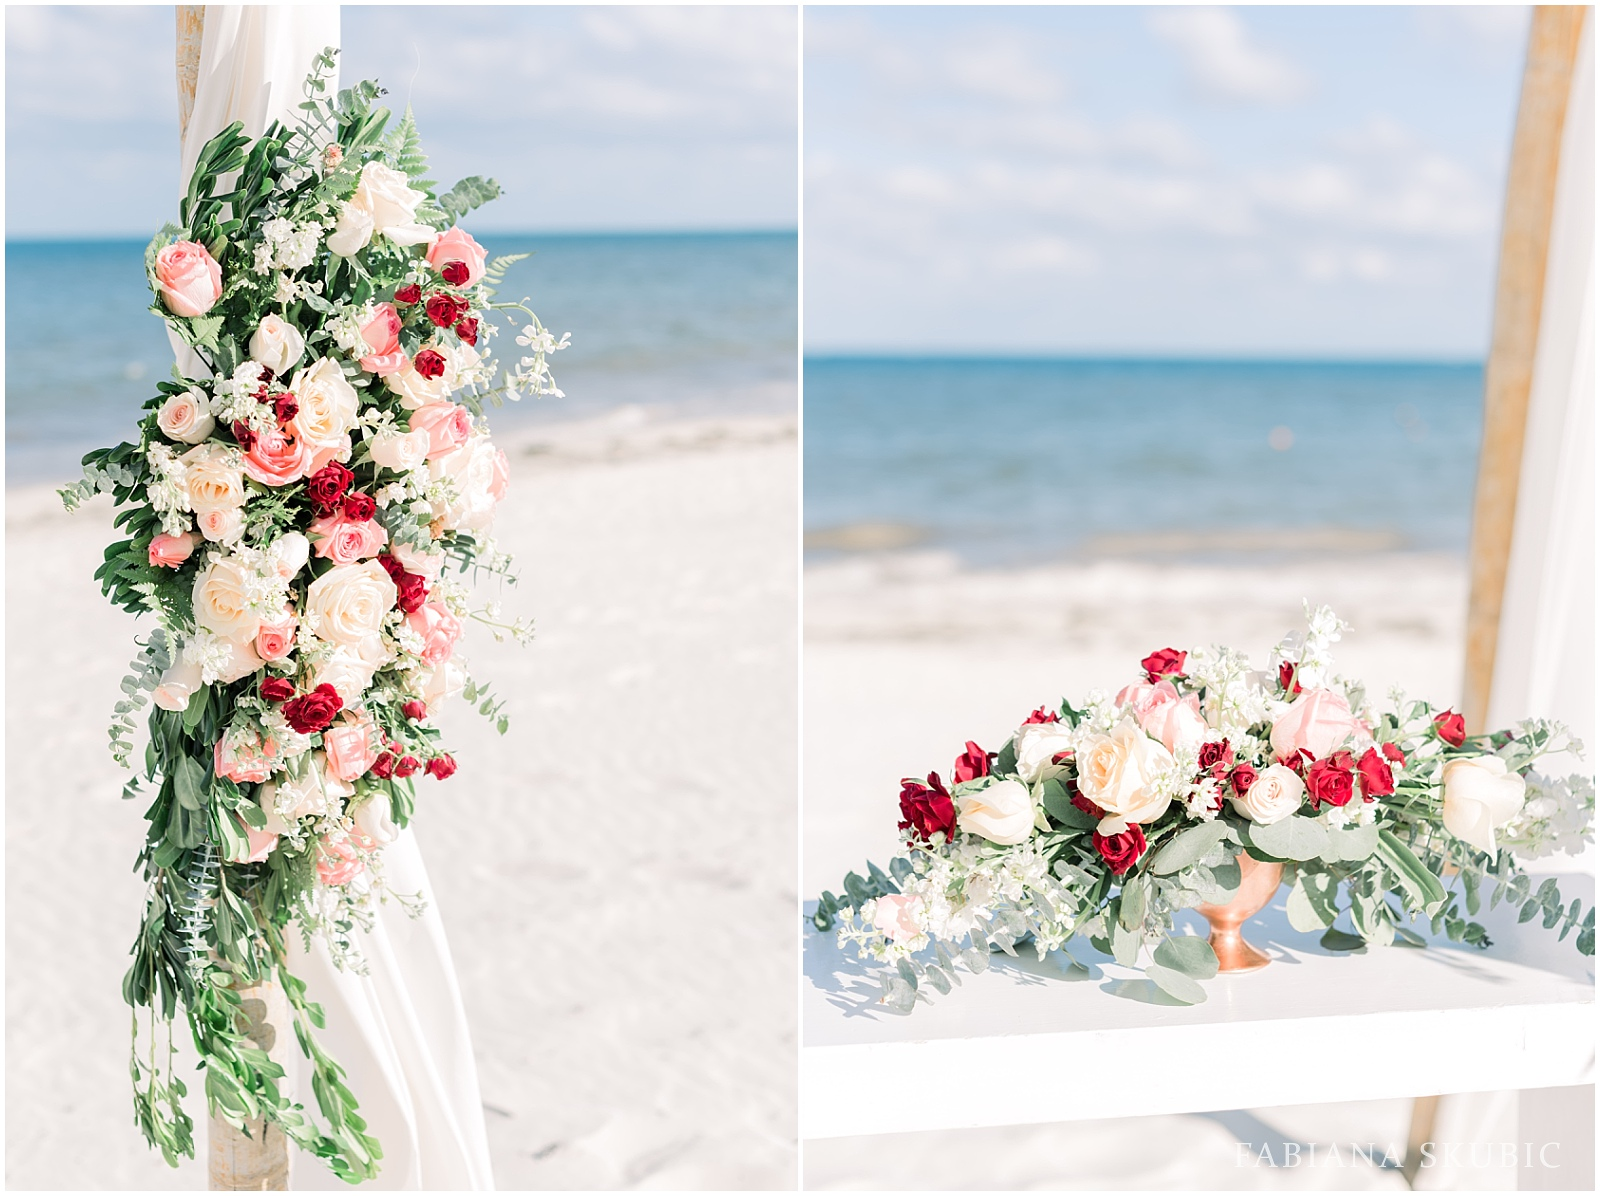 TJ_Now_Sapphire_Riviera_Cancun_Mexico_Wedding_Photos_0223.jpg